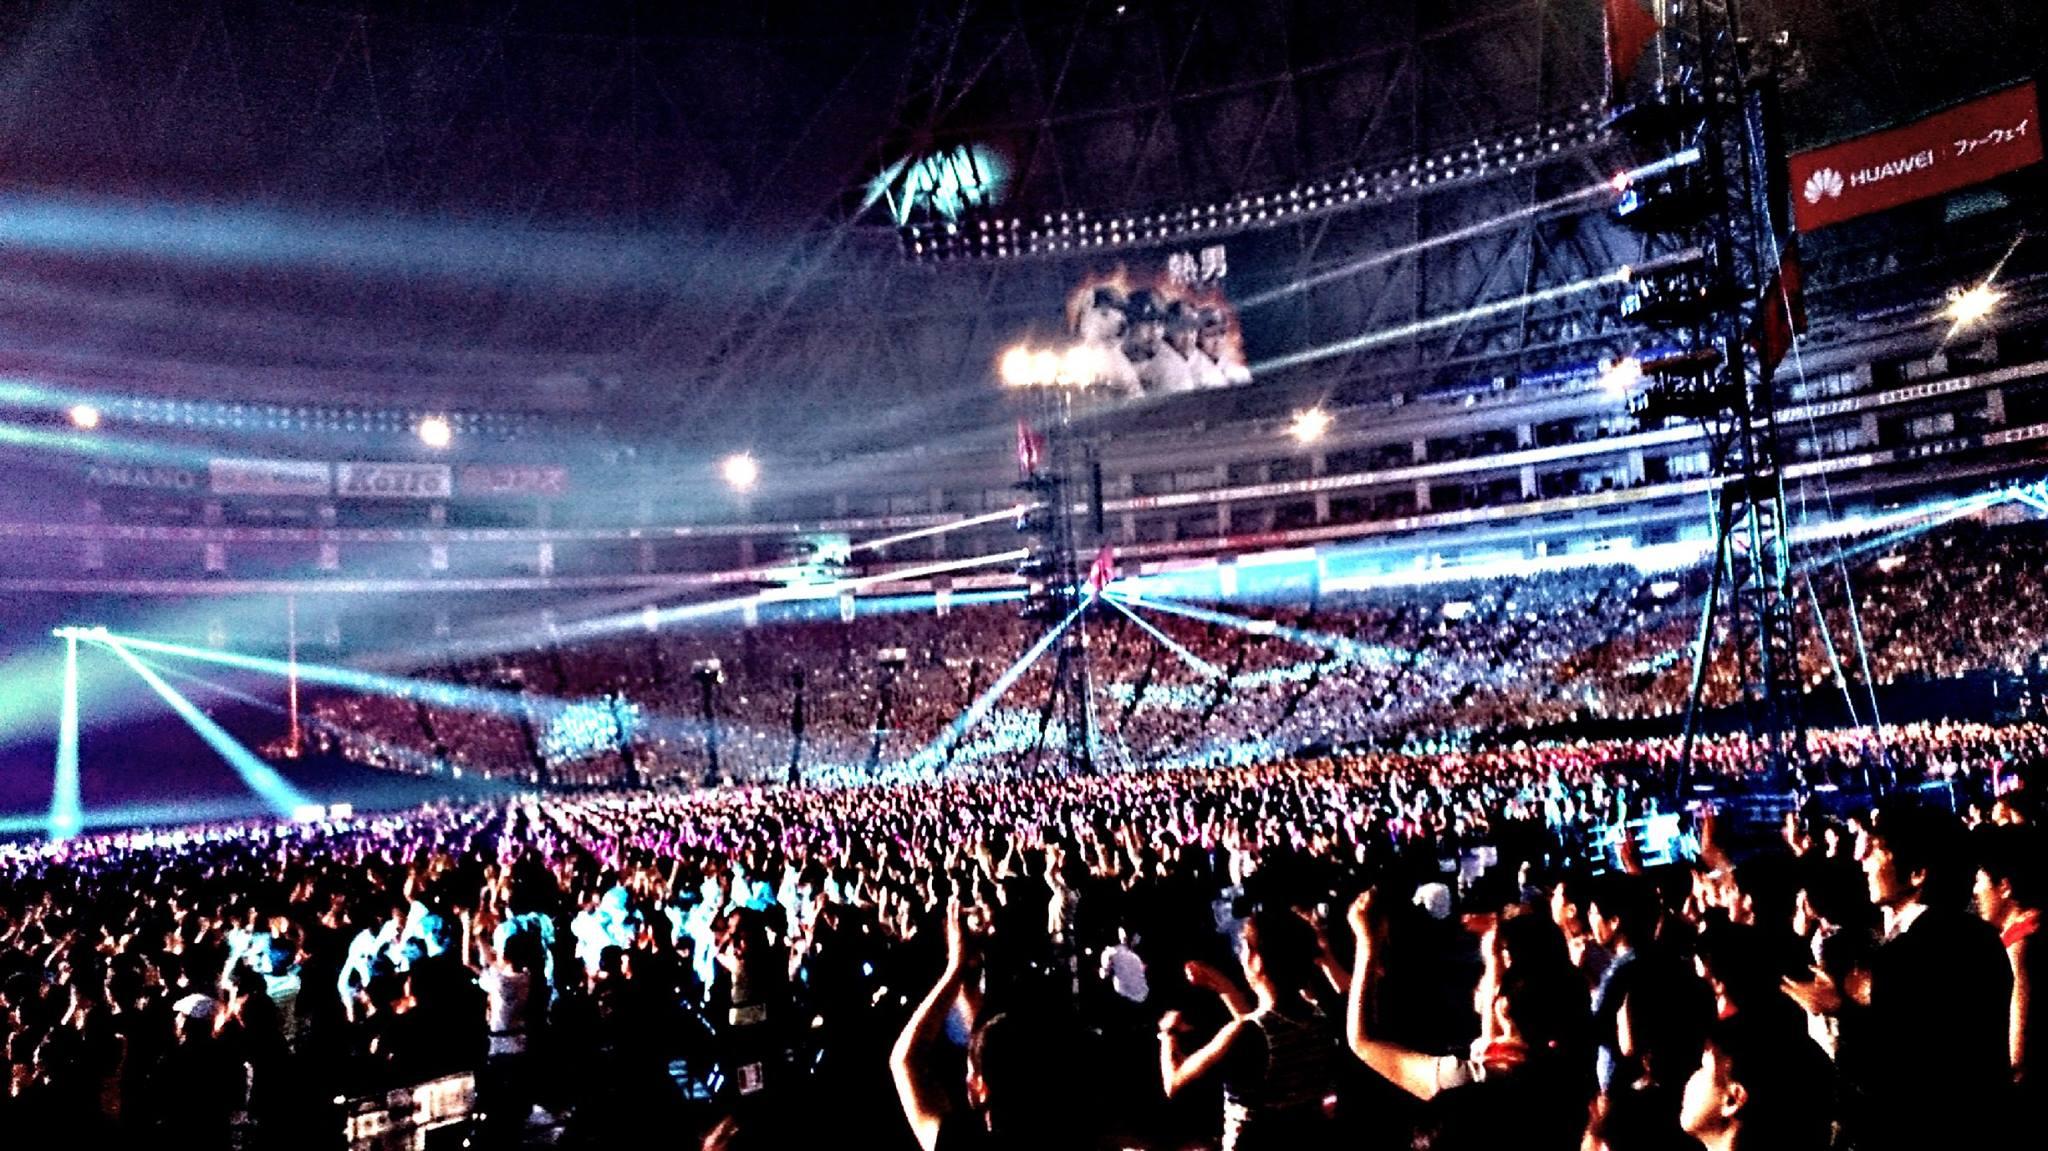 B'z LIVE-GYM 2015 -EPIC NIGHT-福岡 ヤフオク!ドーム1日目SNS情報まとめ!